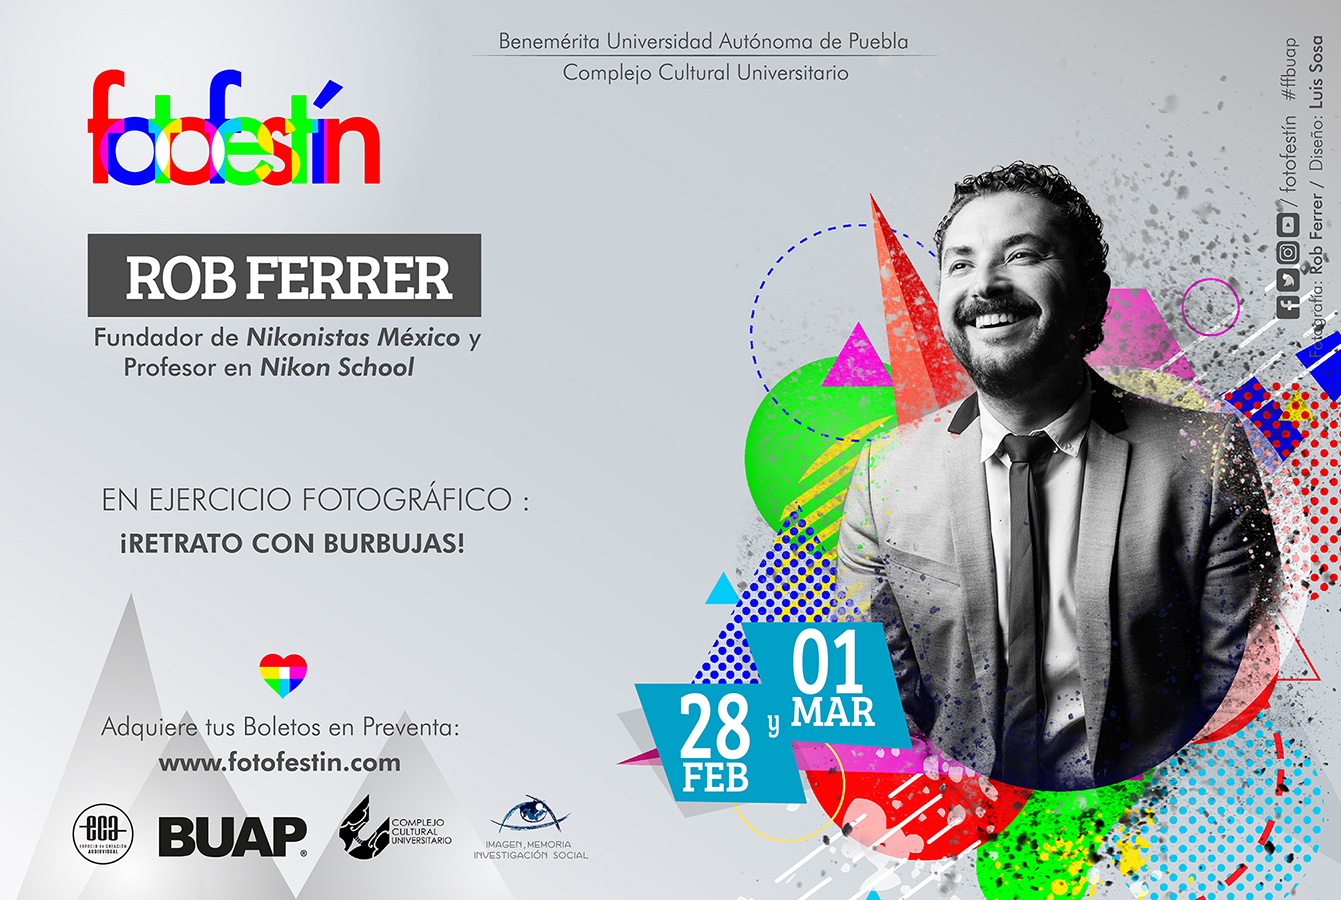 Rob Ferrer Conferencias de fotografia fotofestin